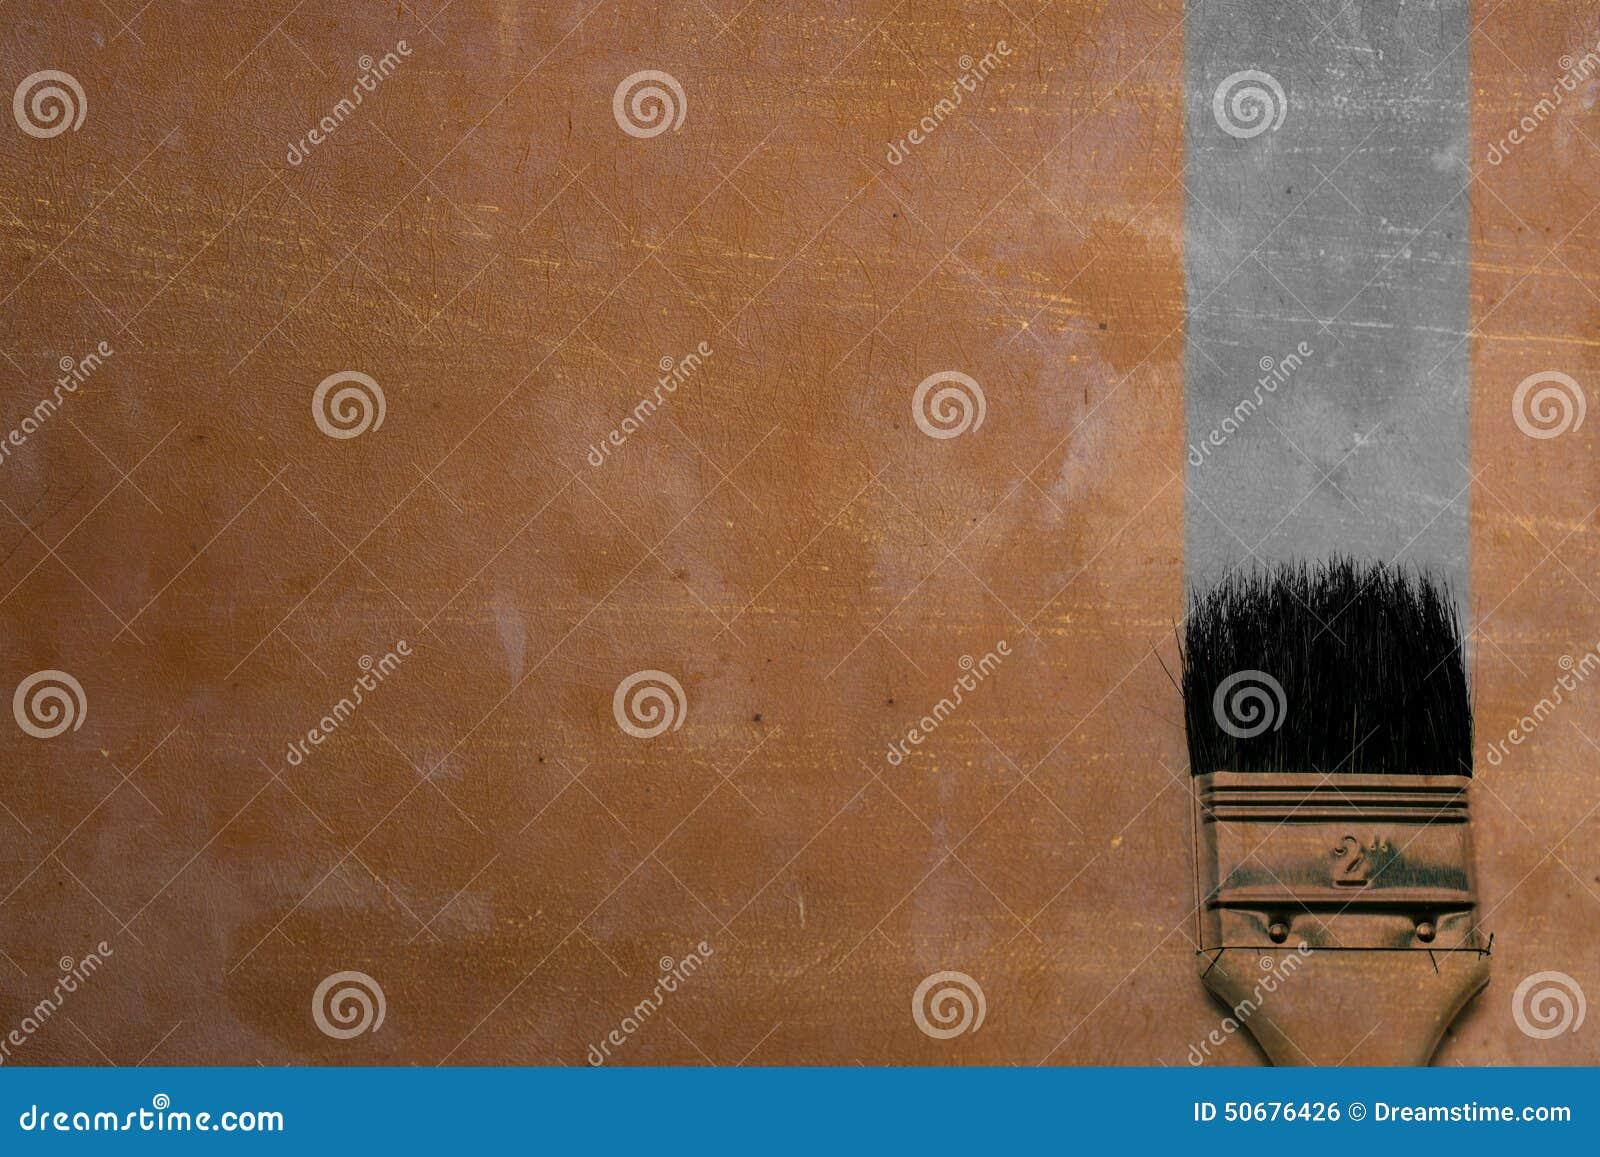 Download 抽象画笔 库存照片. 图片 包括有 掠过的, 纸张, 图象, 油漆, 红色, 铁锈, grunge, 空间 - 50676426